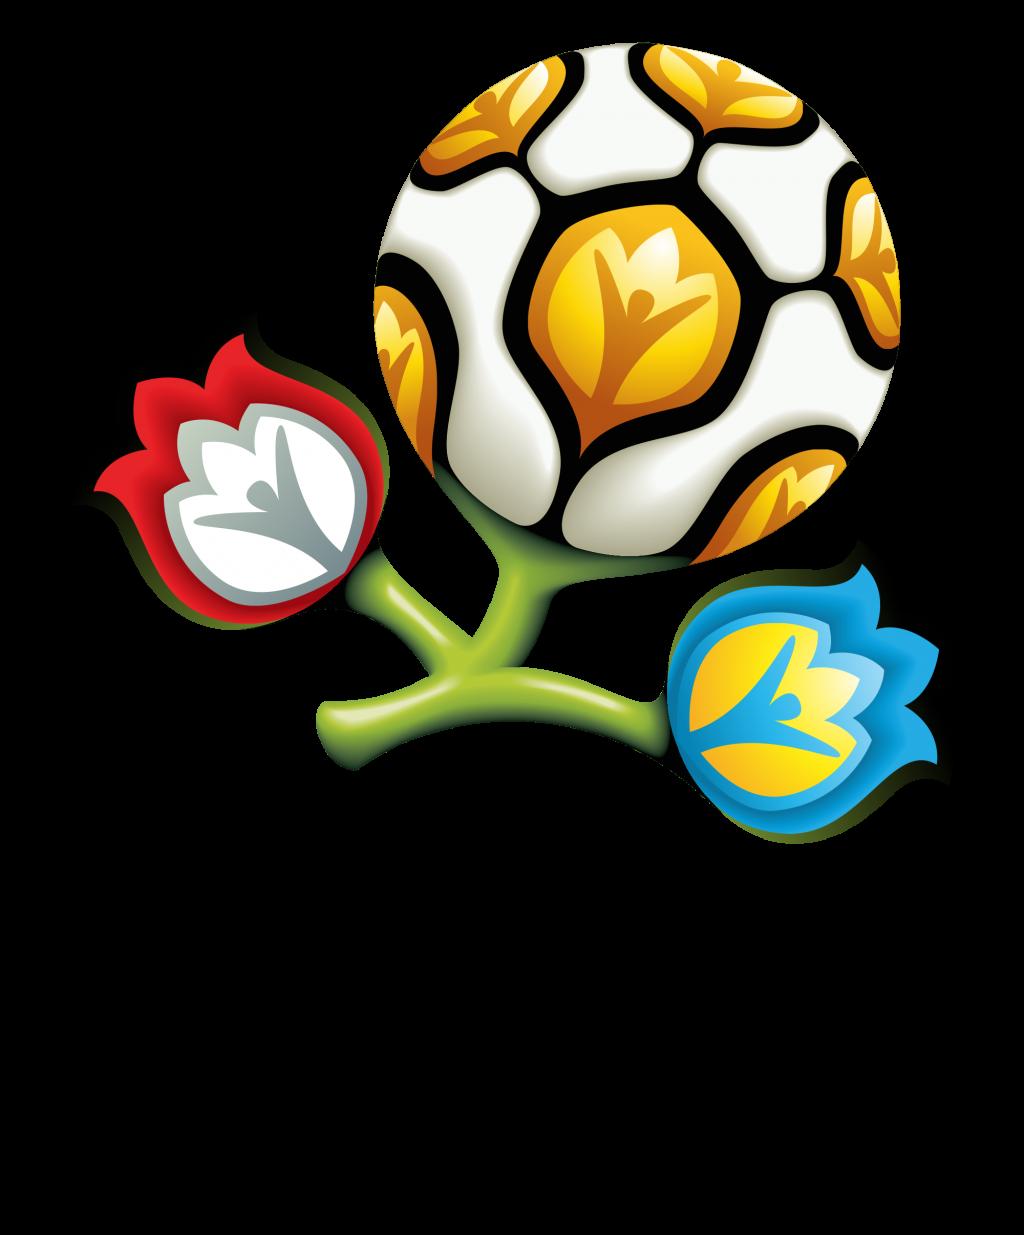 logo-uefa-euro-2012